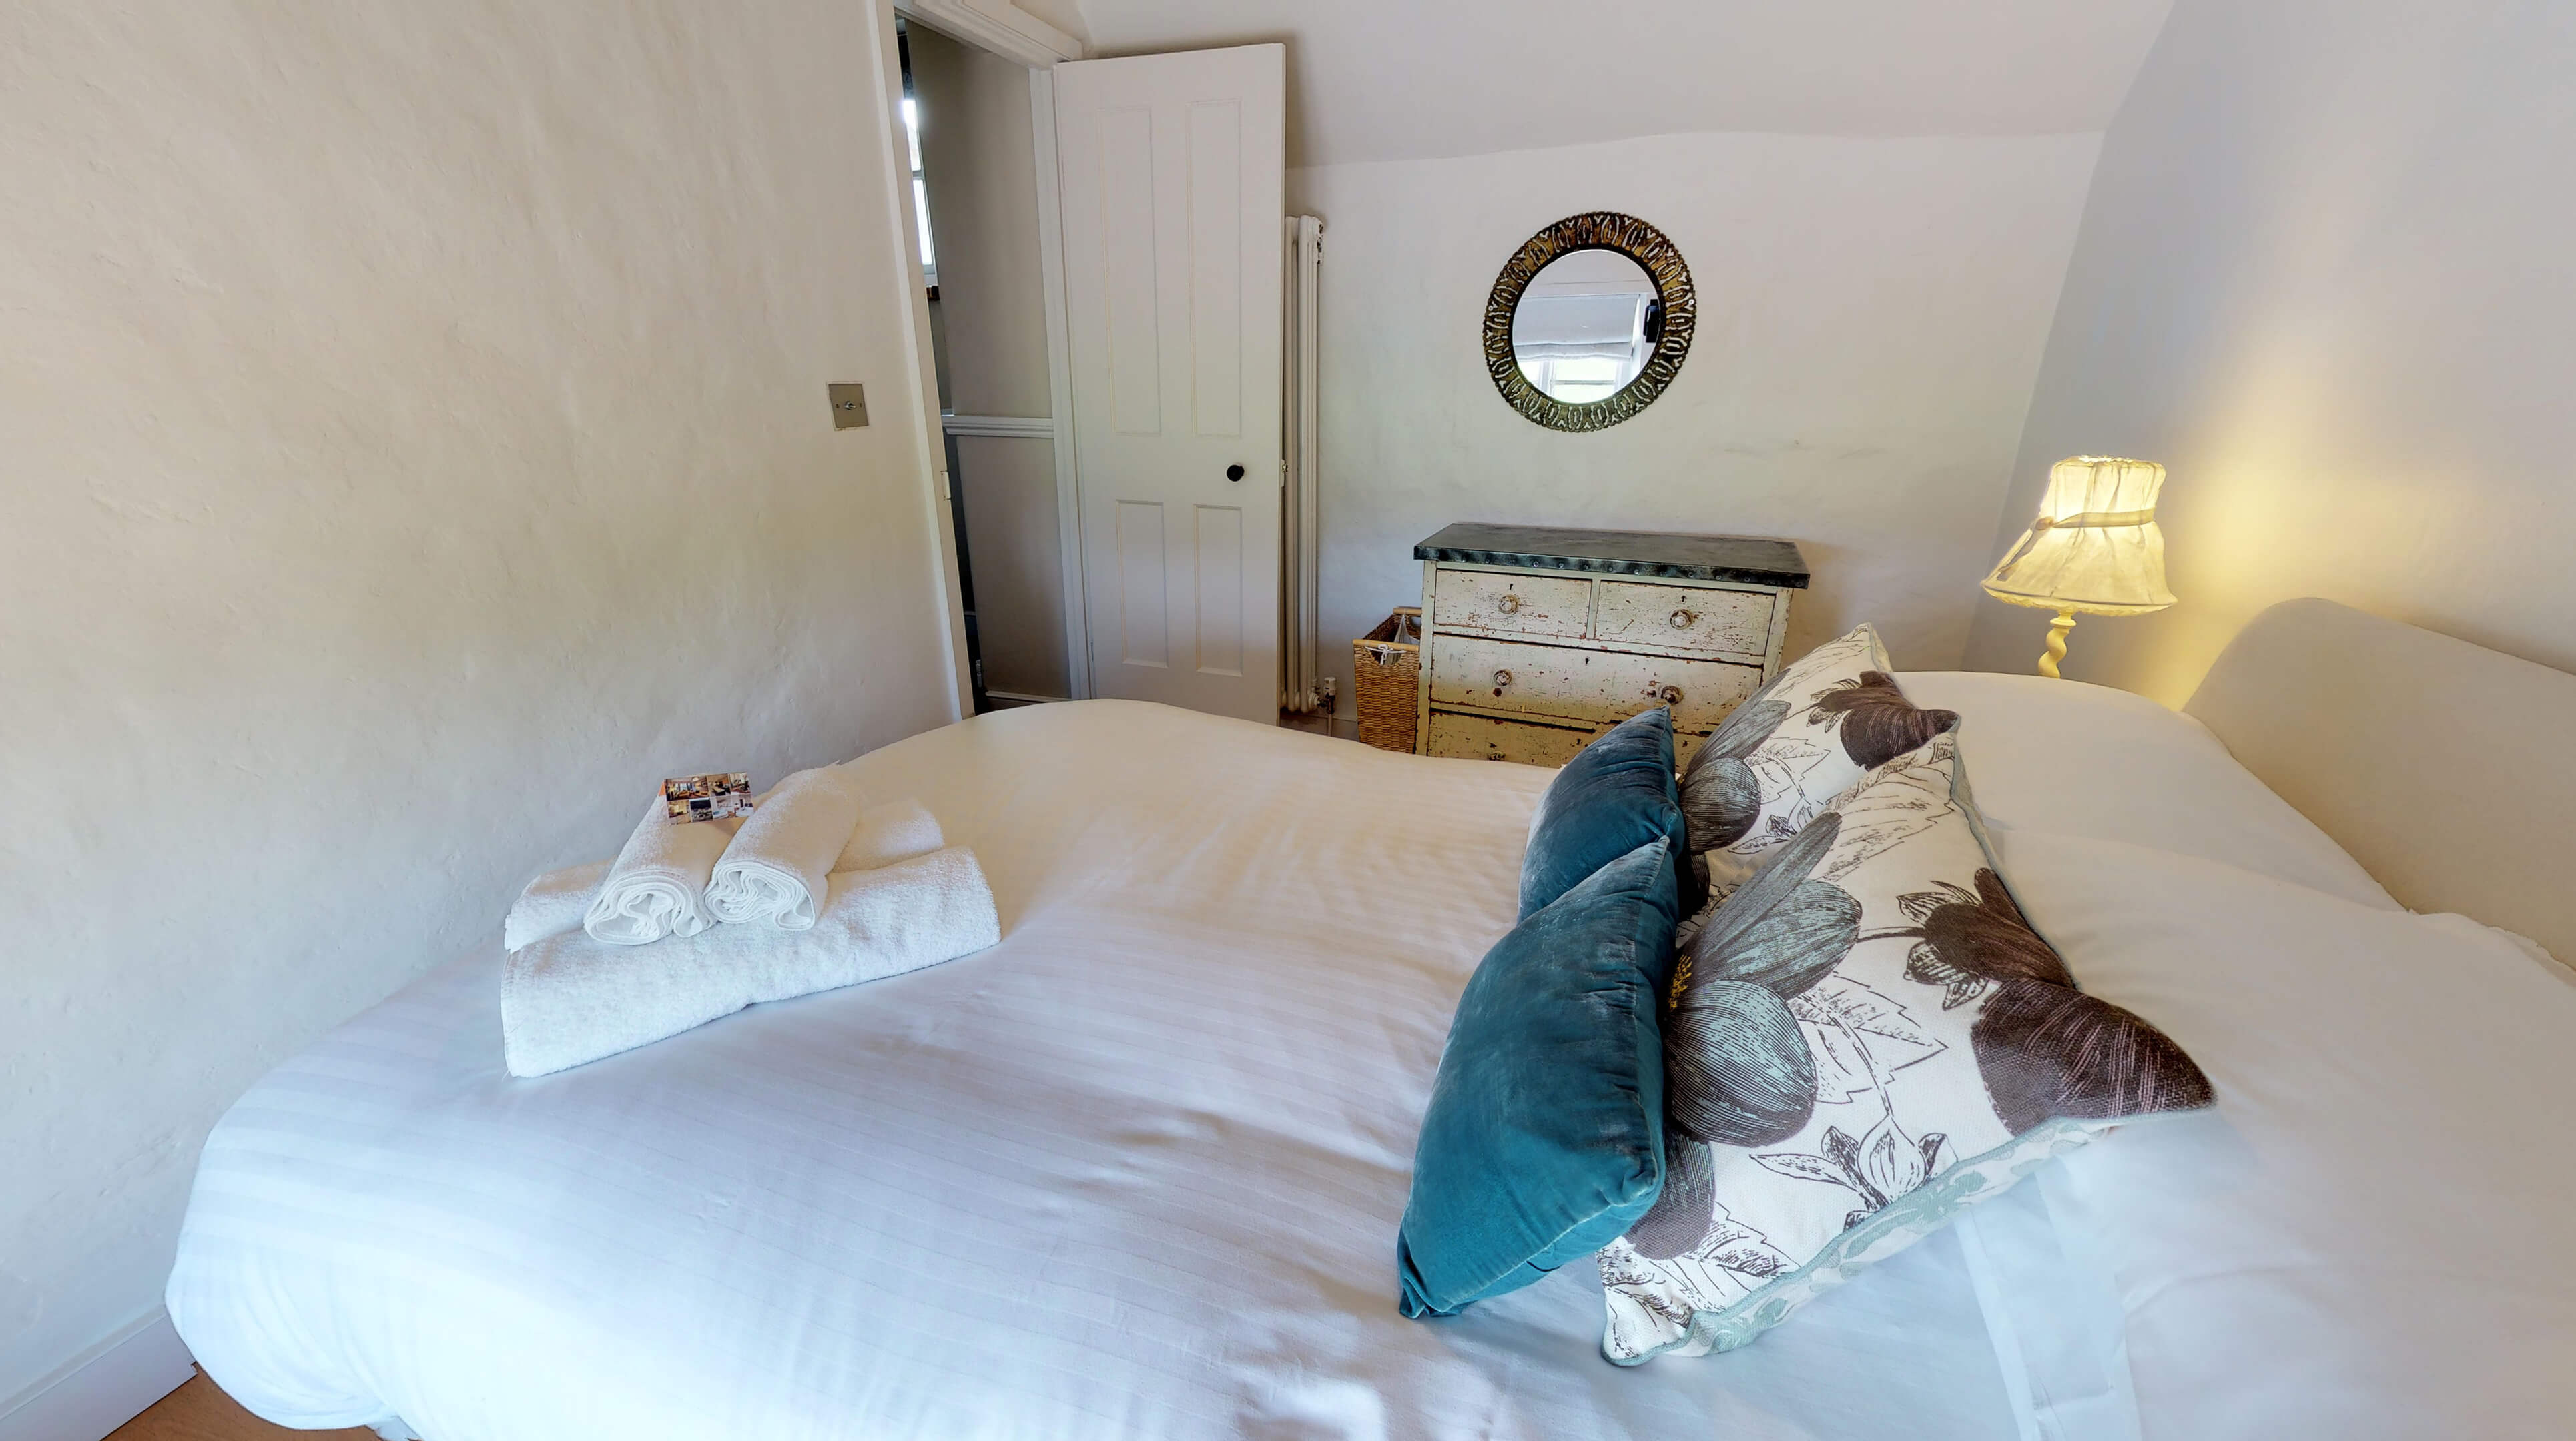 Lower Heyford Three Bedroom Coopers Cottage Bedroom One 2